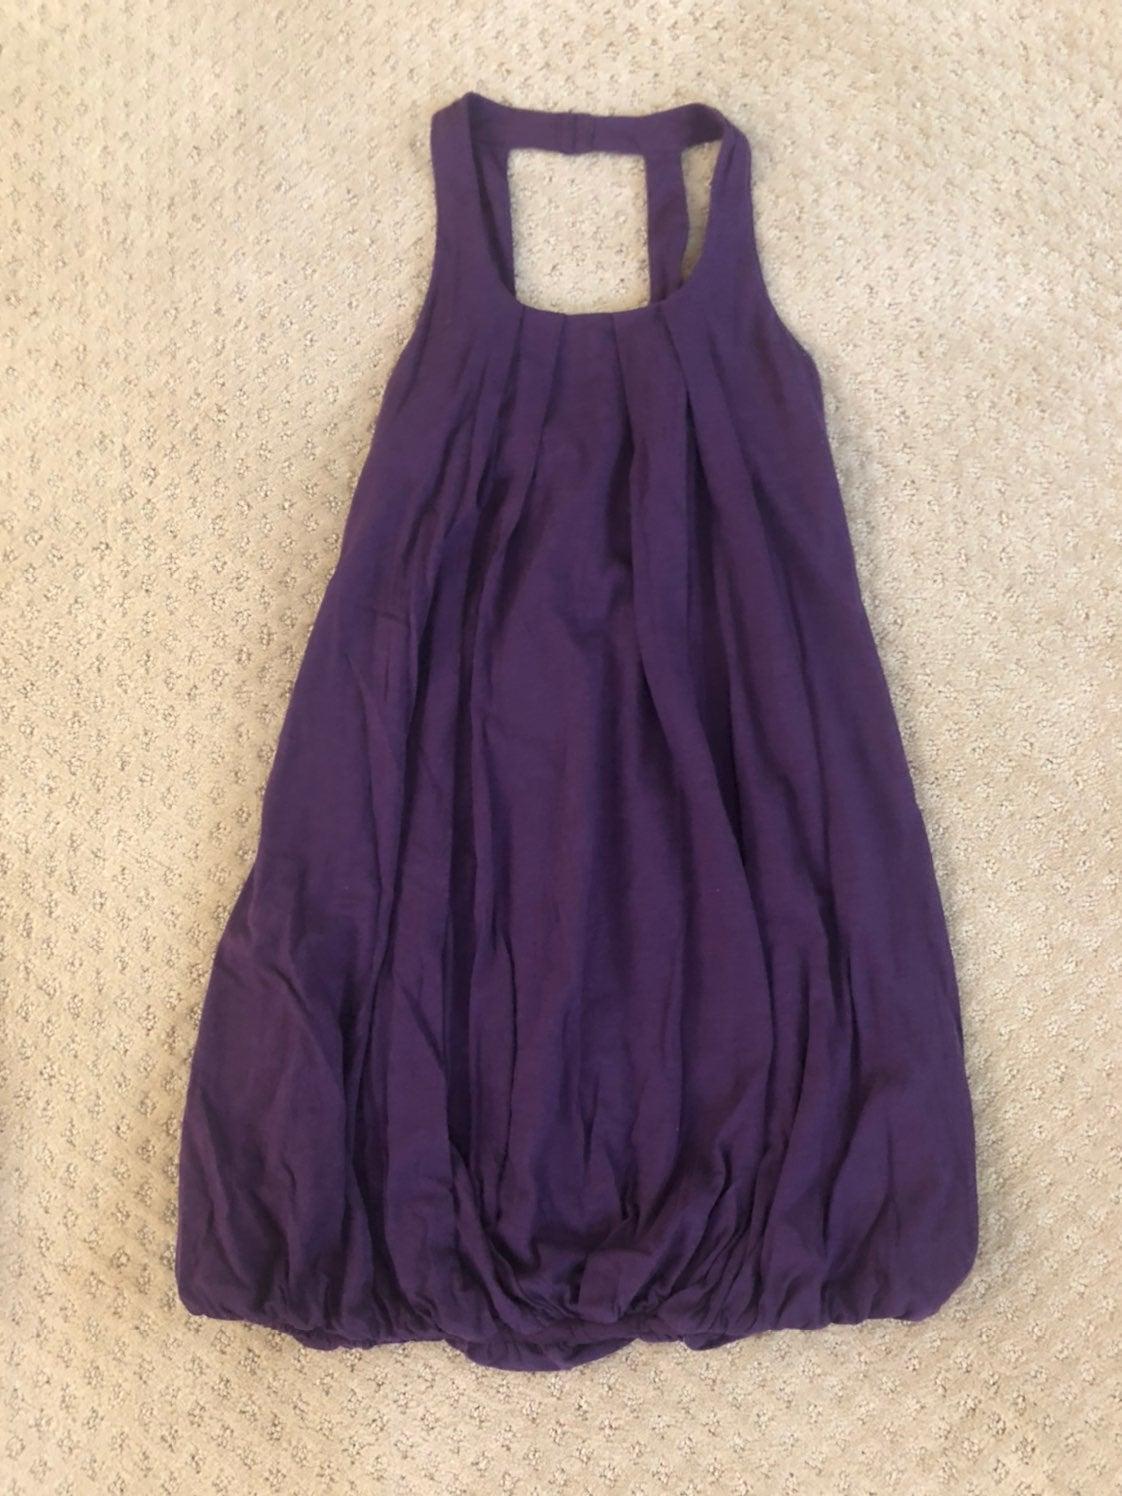 Apostrophe purple dress